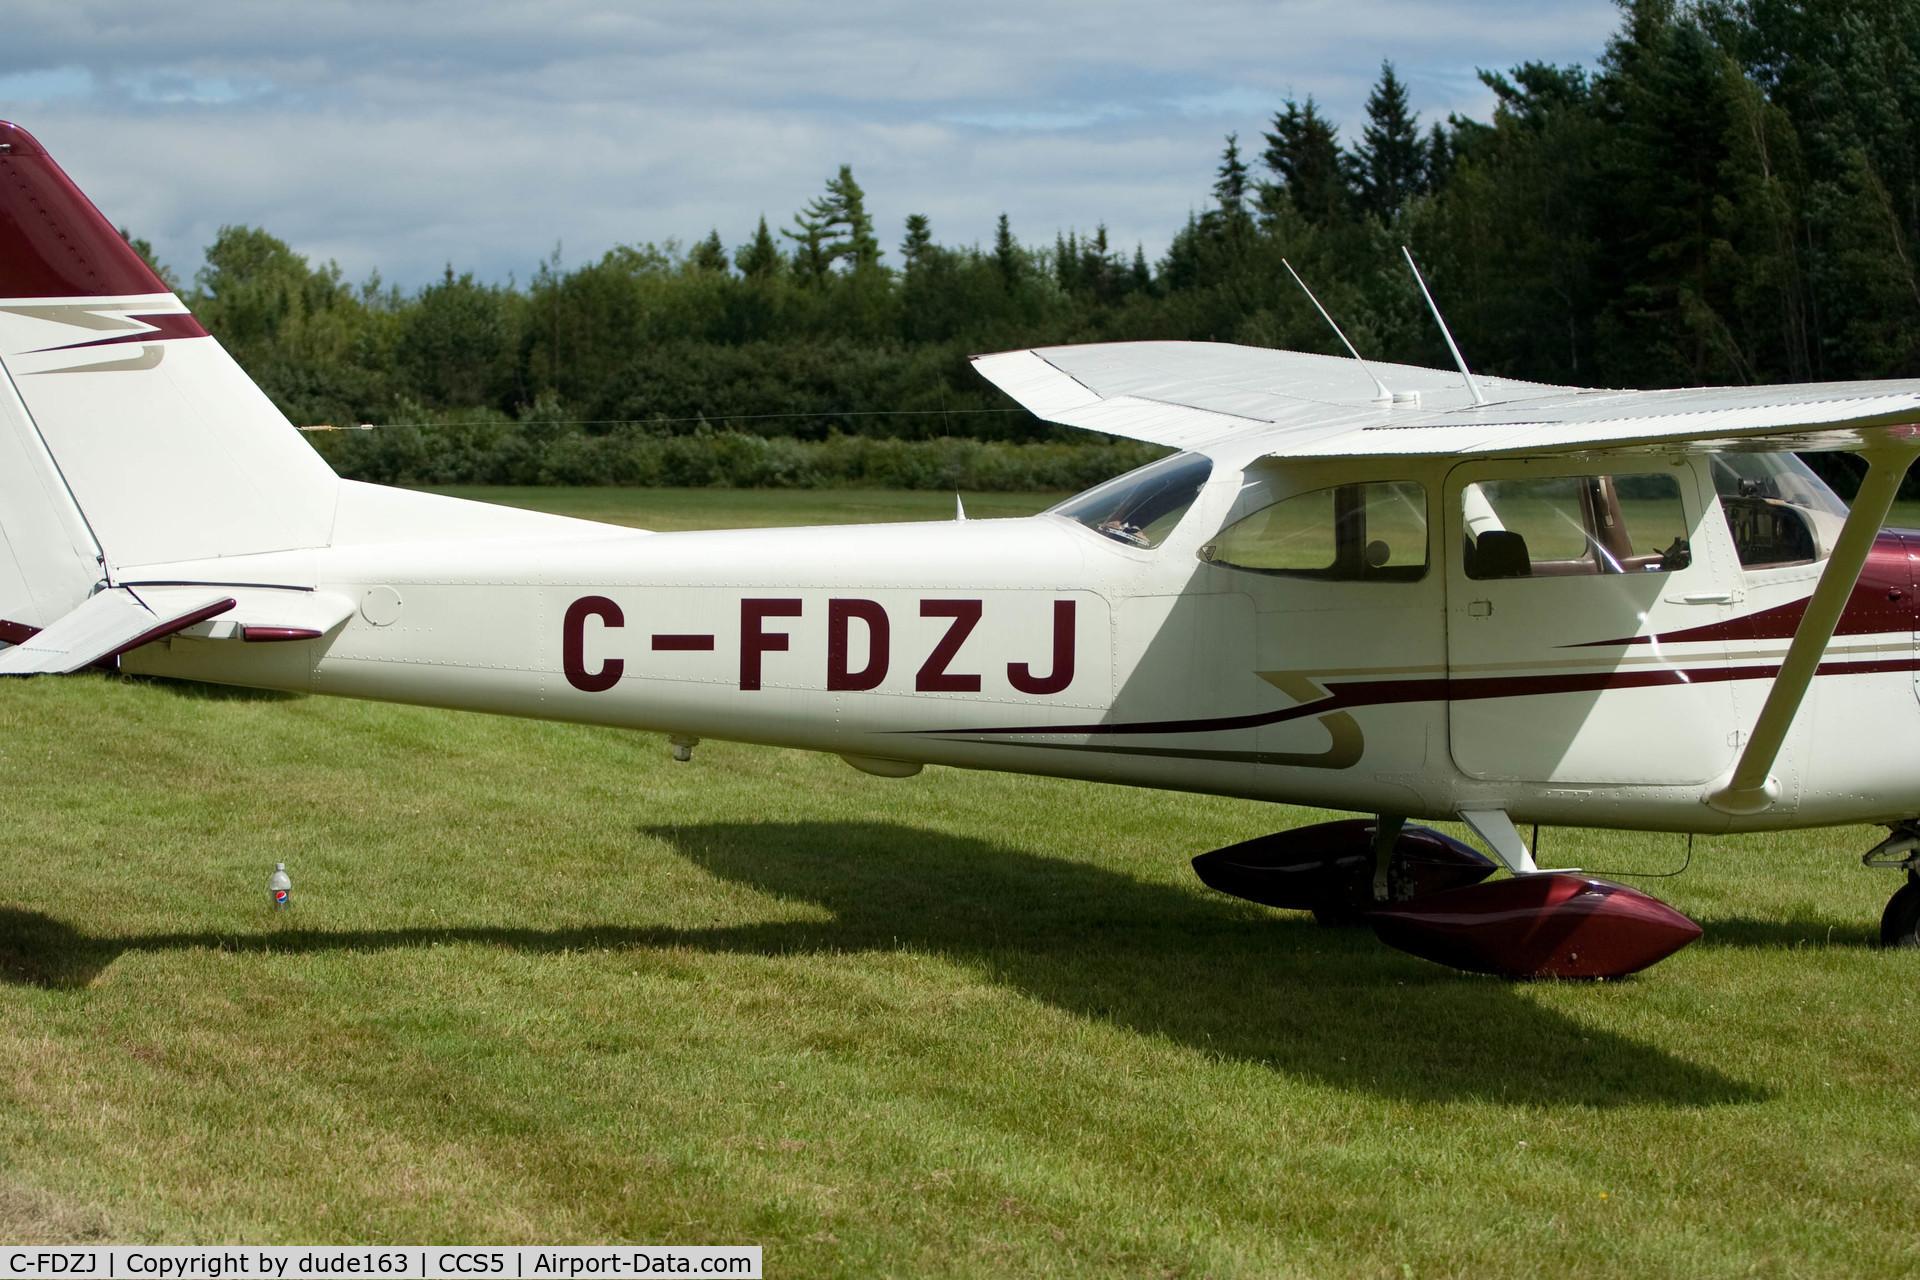 C-FDZJ, 1966 Cessna 172G Skyhawk C/N 17254151, Havelock flyin 2009